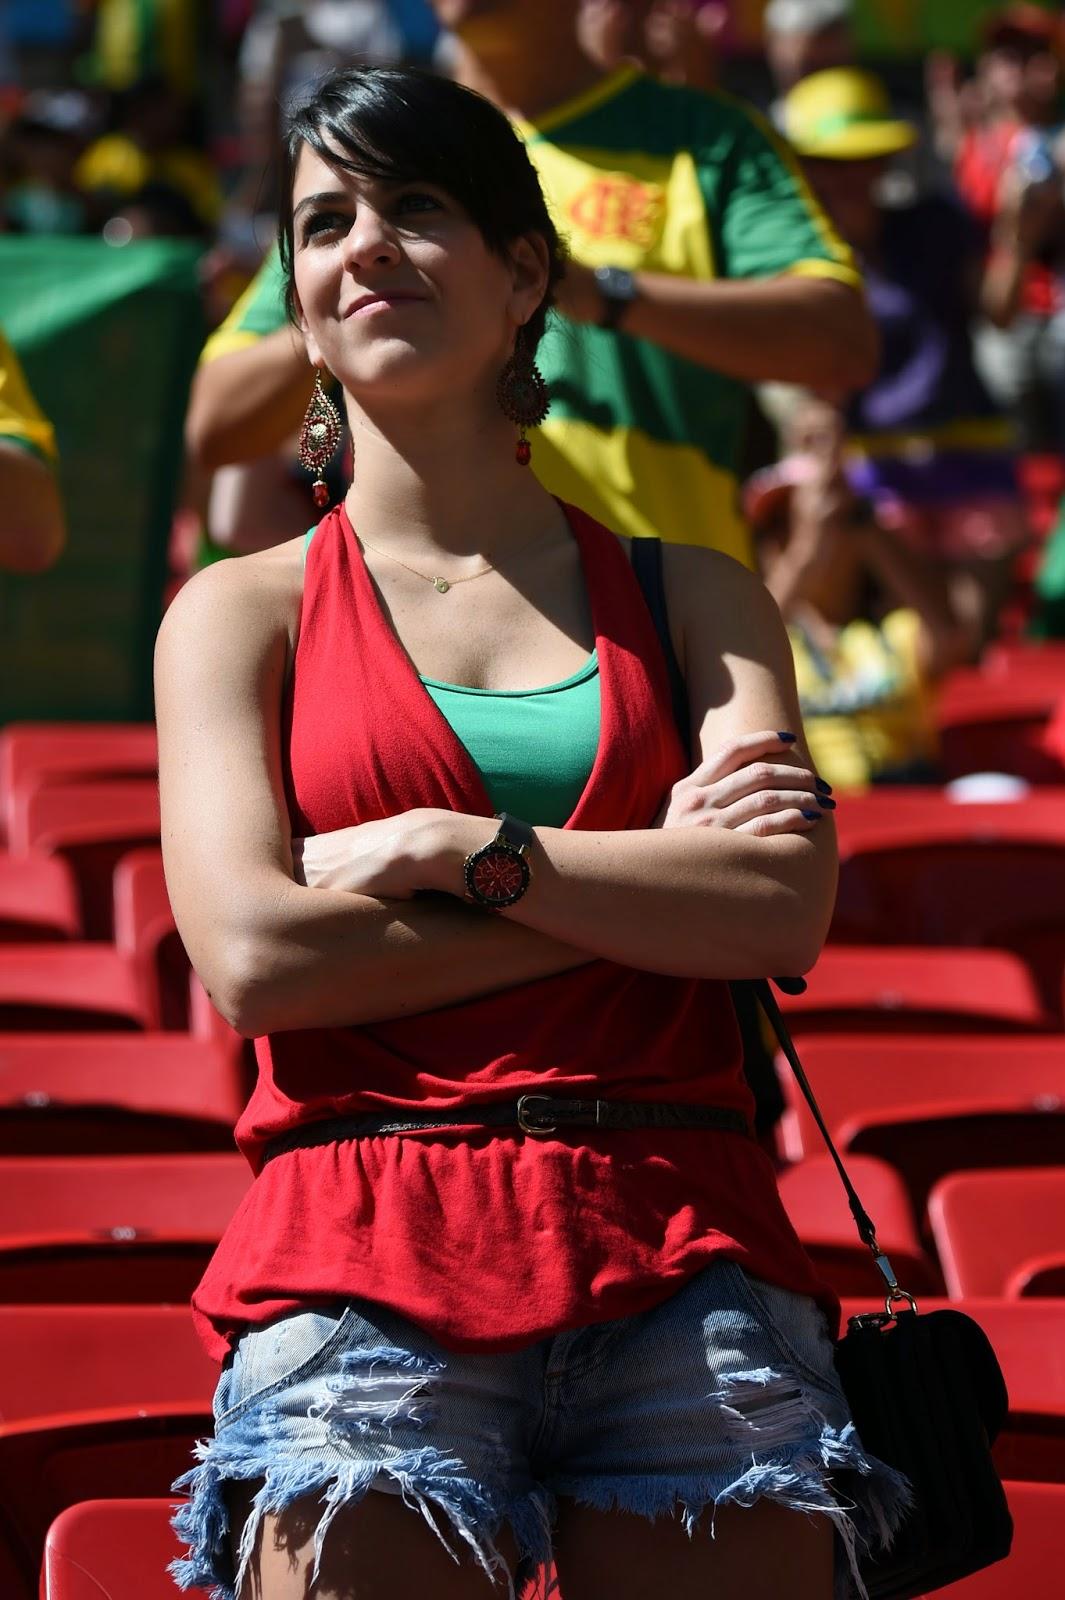 Brazil, CR7, Cristiano Ronaldo, Eder, FIFA World Cup, FIFA World Cup 2014, Football, Ghana Match, Group G, John Boye, Jonathan Mensah, Paulo Bento, Pepe, Portugal Match, Portugal vs Ghana, Sports,